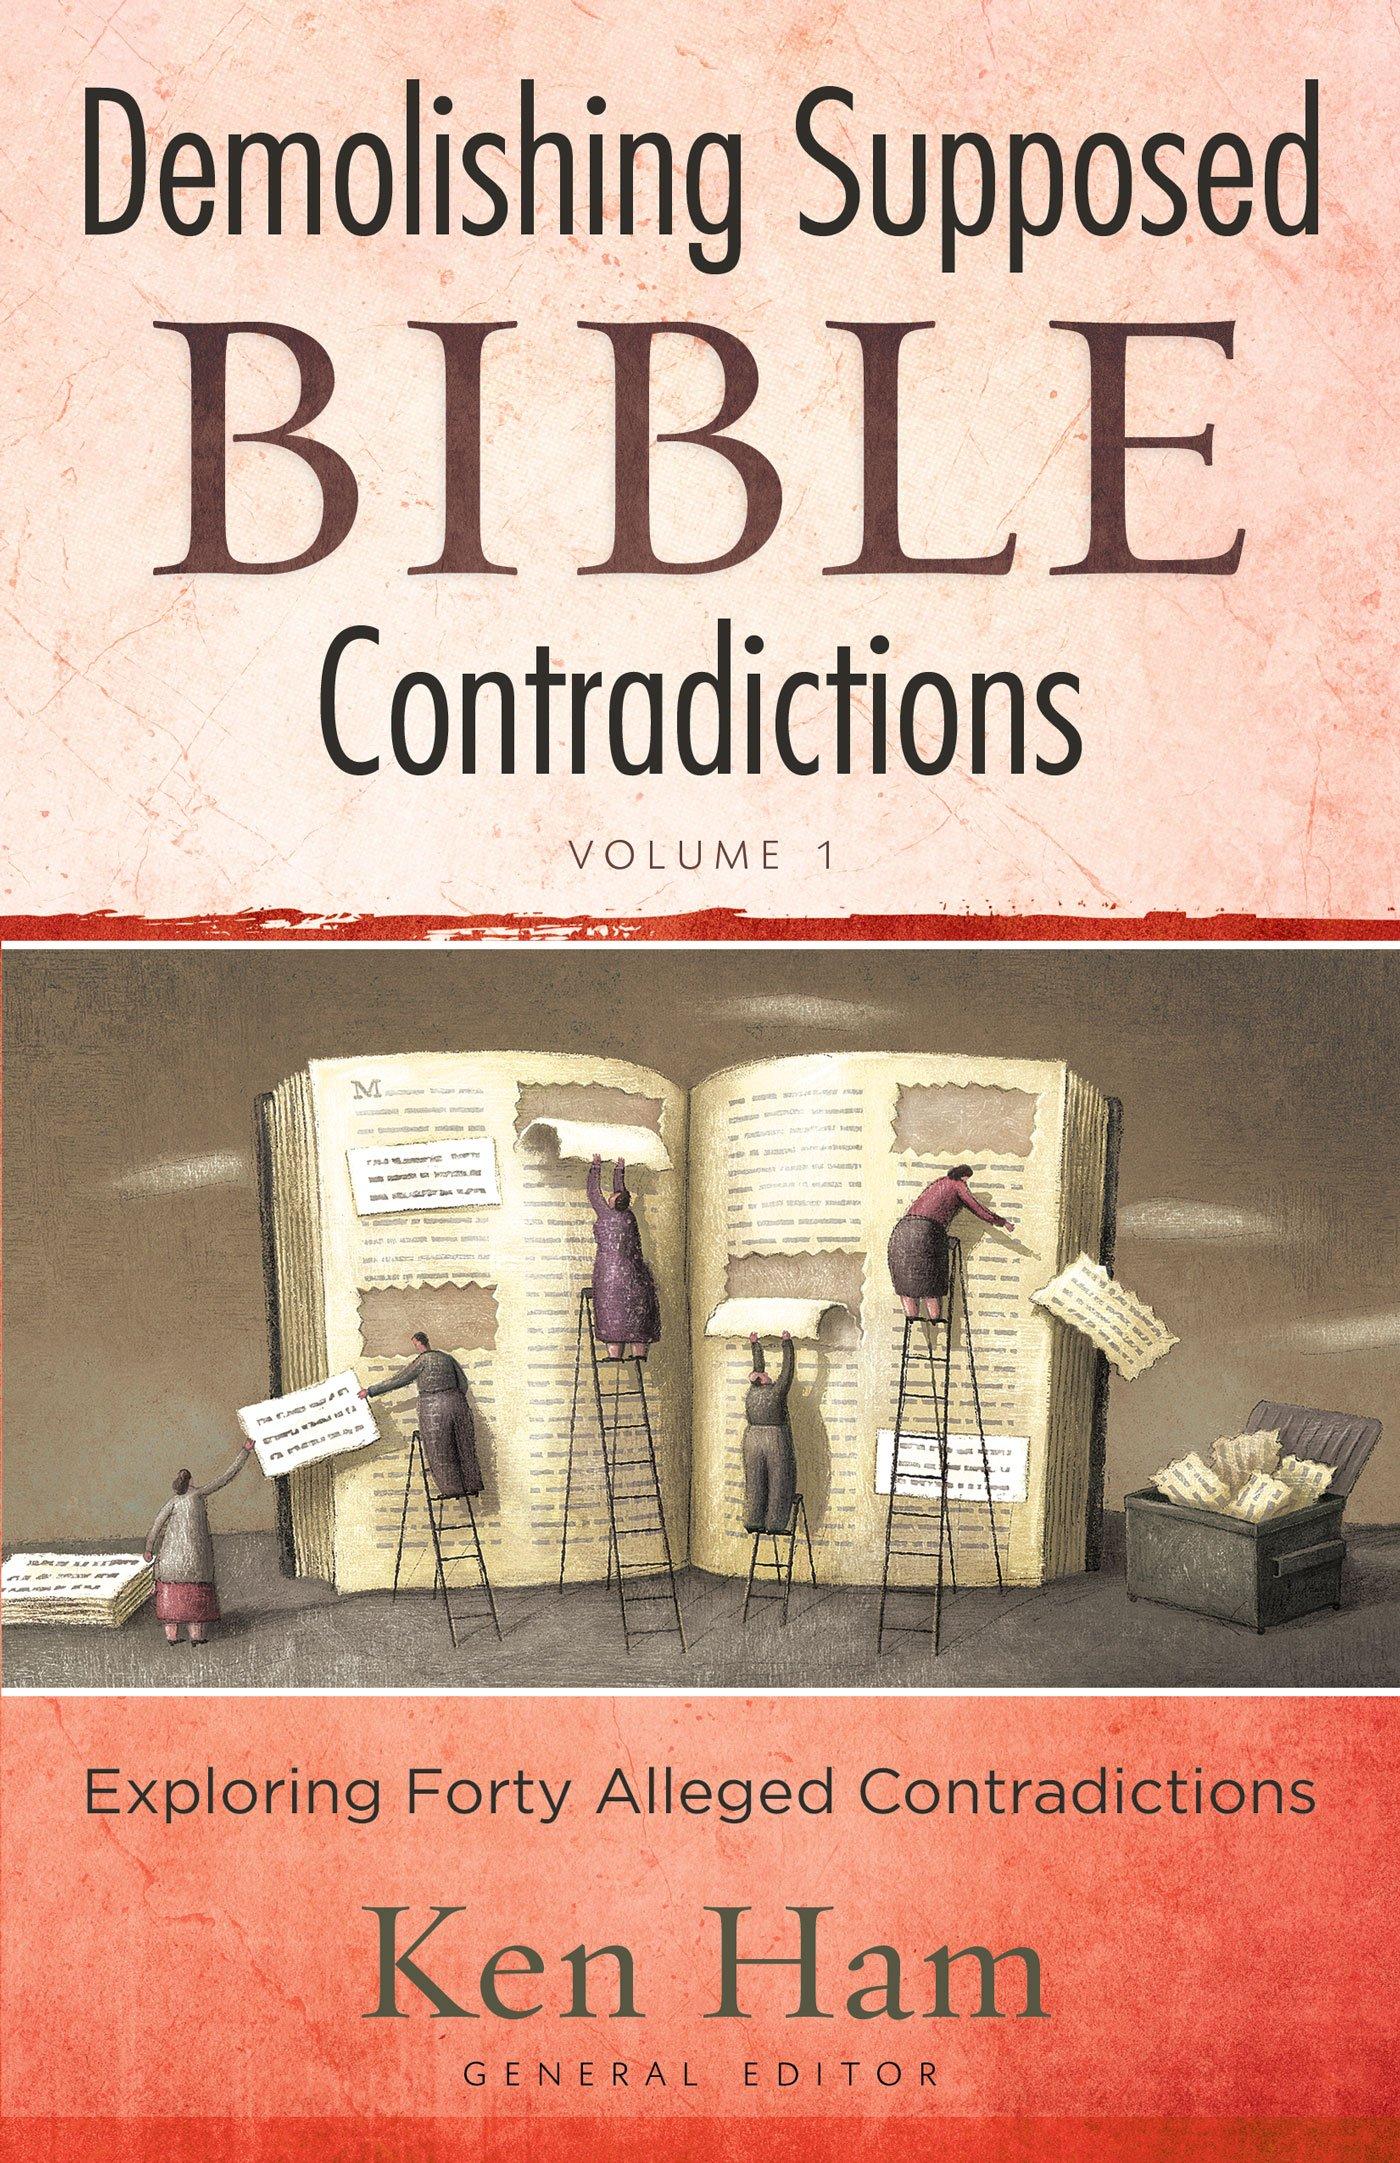 Demolishing Supposed Bible Contradictions Volume 1: Ken Ham: 9780890516003:  Amazon.com: Books